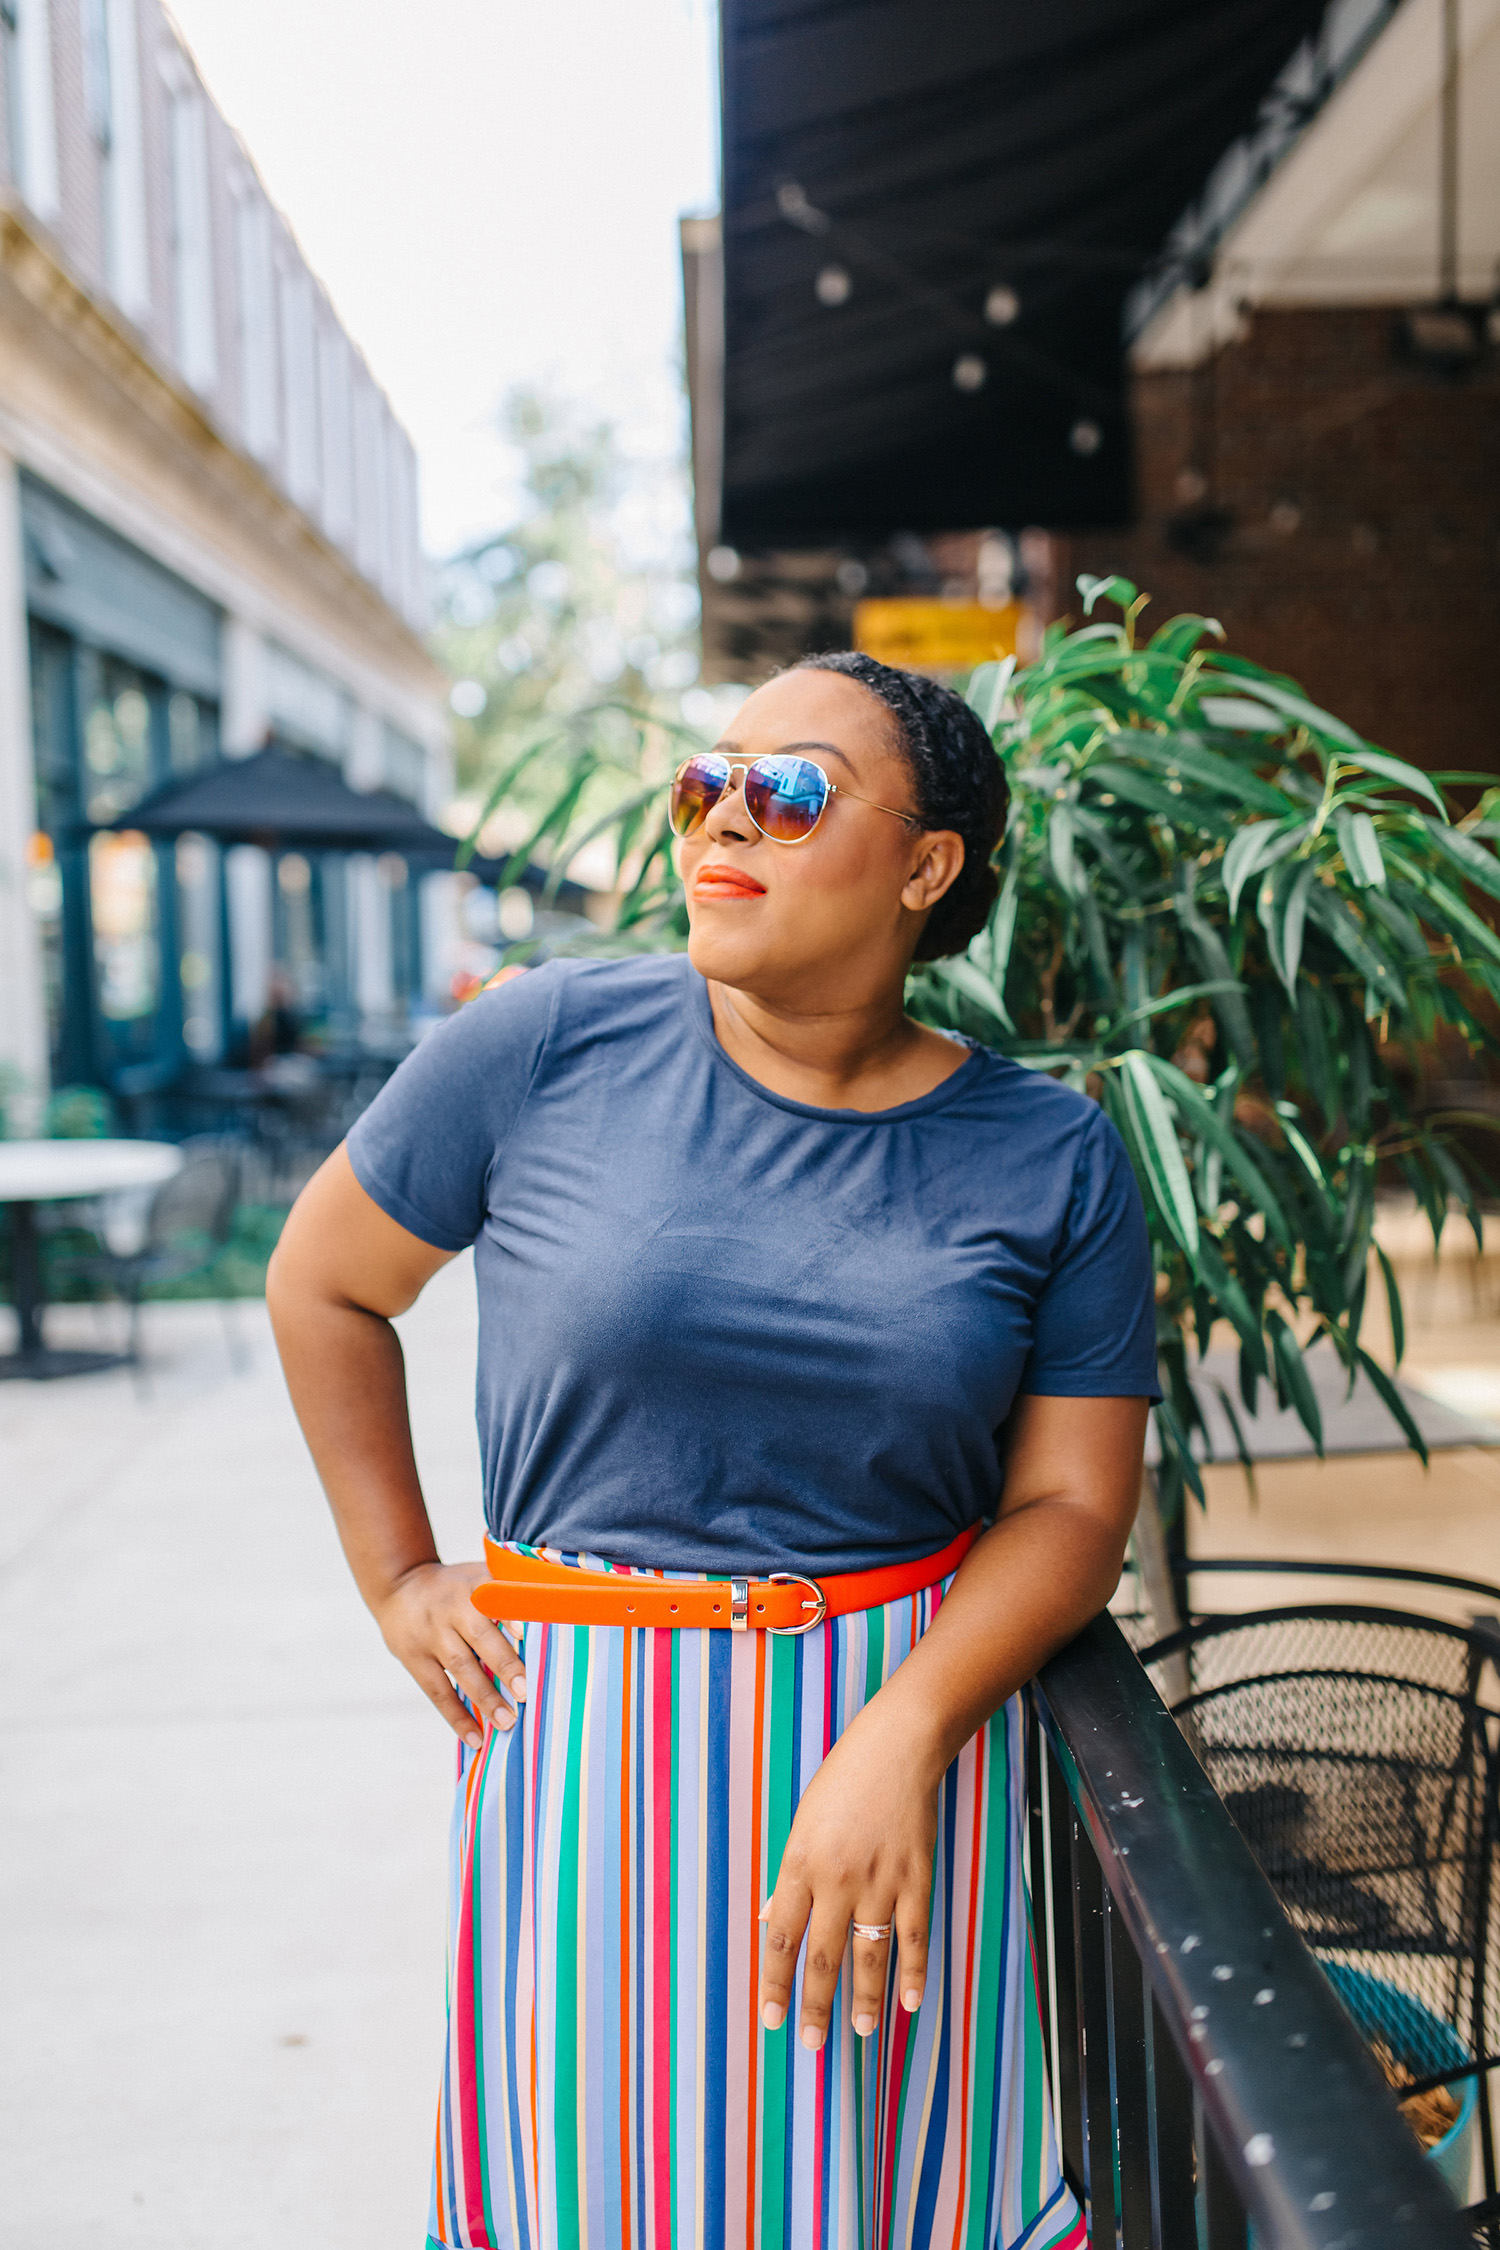 Colorful Striped Skirt - Bianca Dottin - Orlando Fashion Blogger